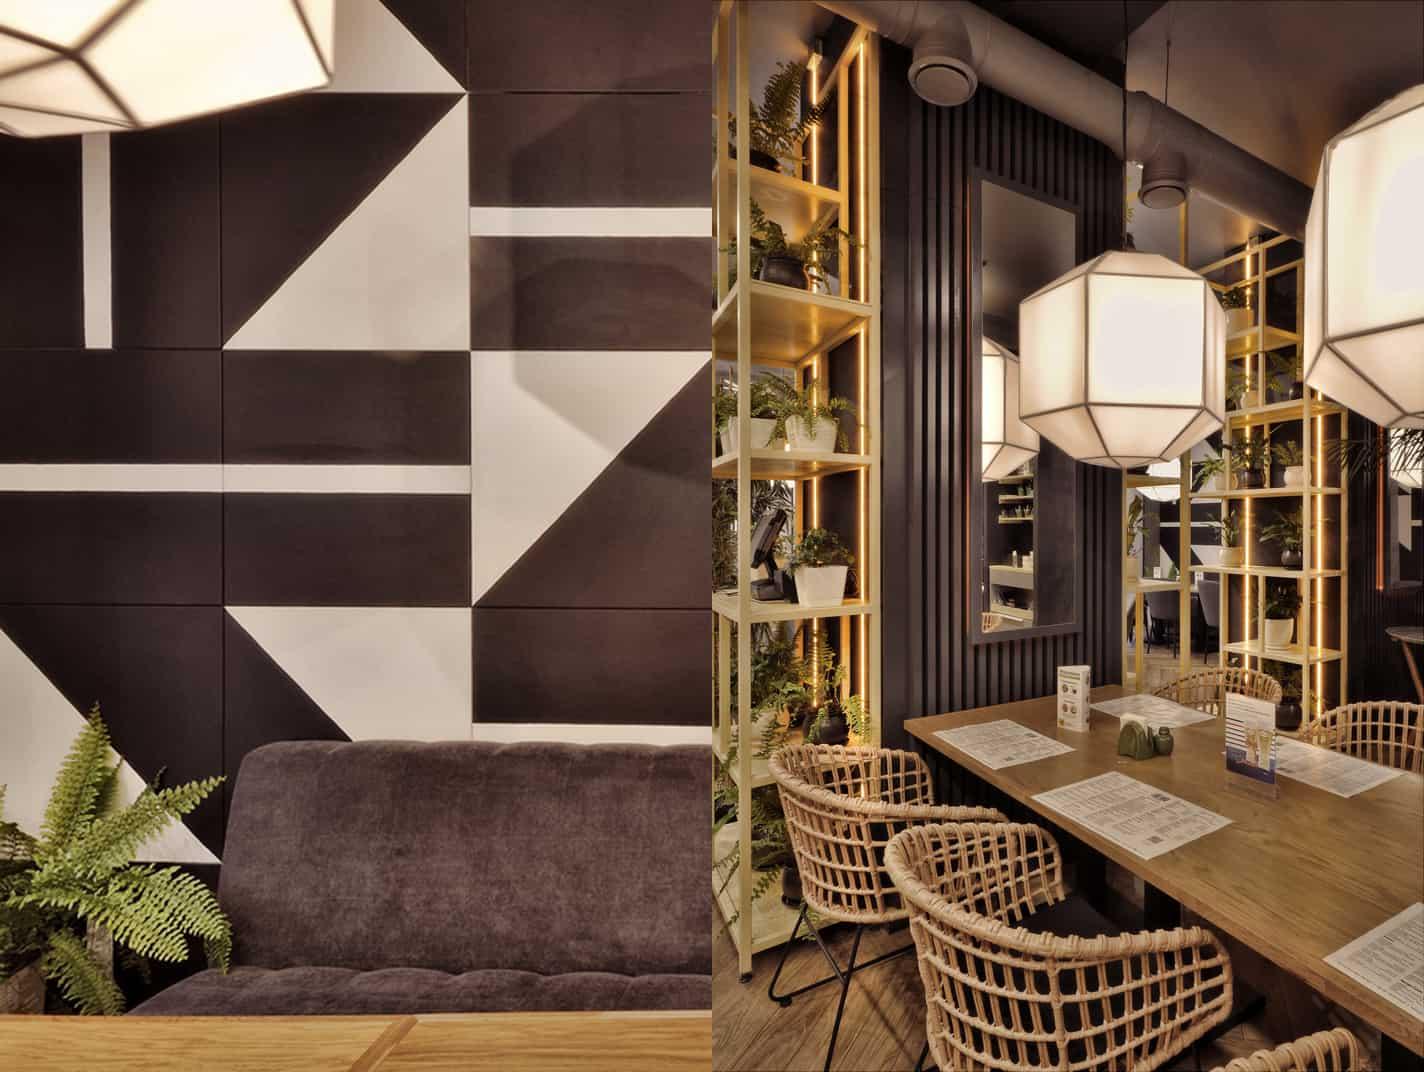 Lao Bao panasian cafe design in Russia